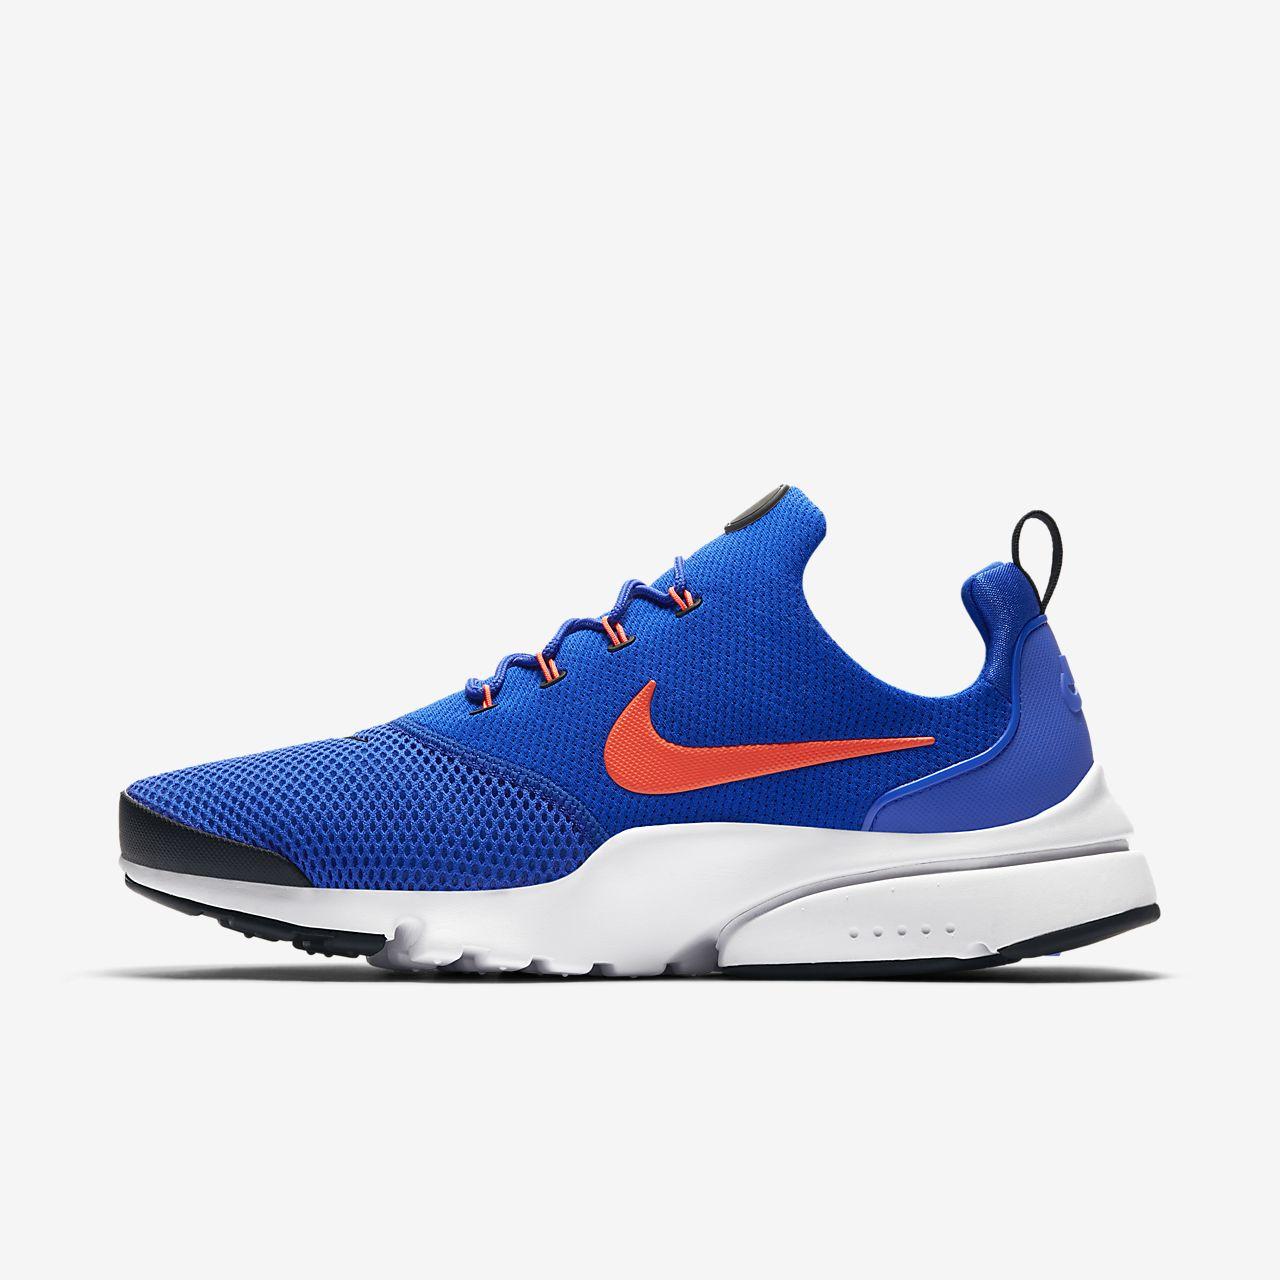 Мужские кроссовки Nike Presto Fly. Nike.com RU 6d1e4dcf97729